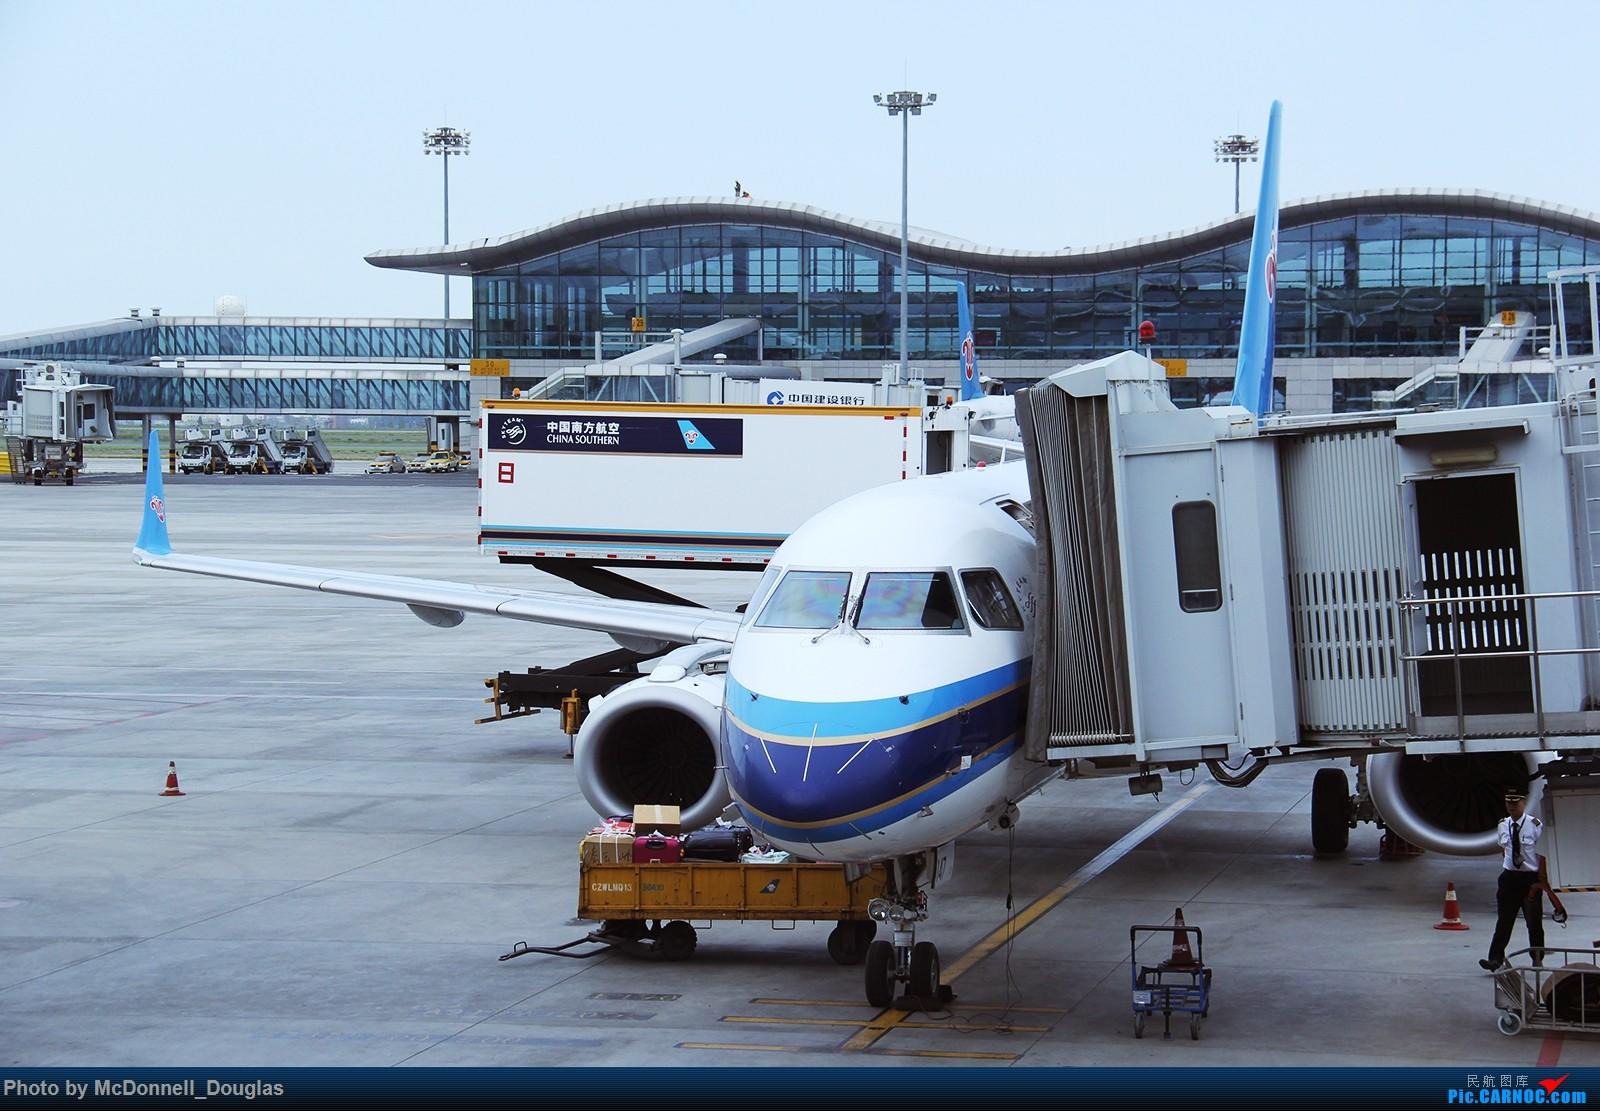 Re:[原创]【上海飞友会】【zc带你走天下(3)】再访祖辈年轻时工作的土地,父母年少时生活戈壁,跨越大半个中国去看新疆,回程小游蓉城(下) EMBRAER ERJ-190LR B-3147 中国乌鲁木齐地窝堡国际机场